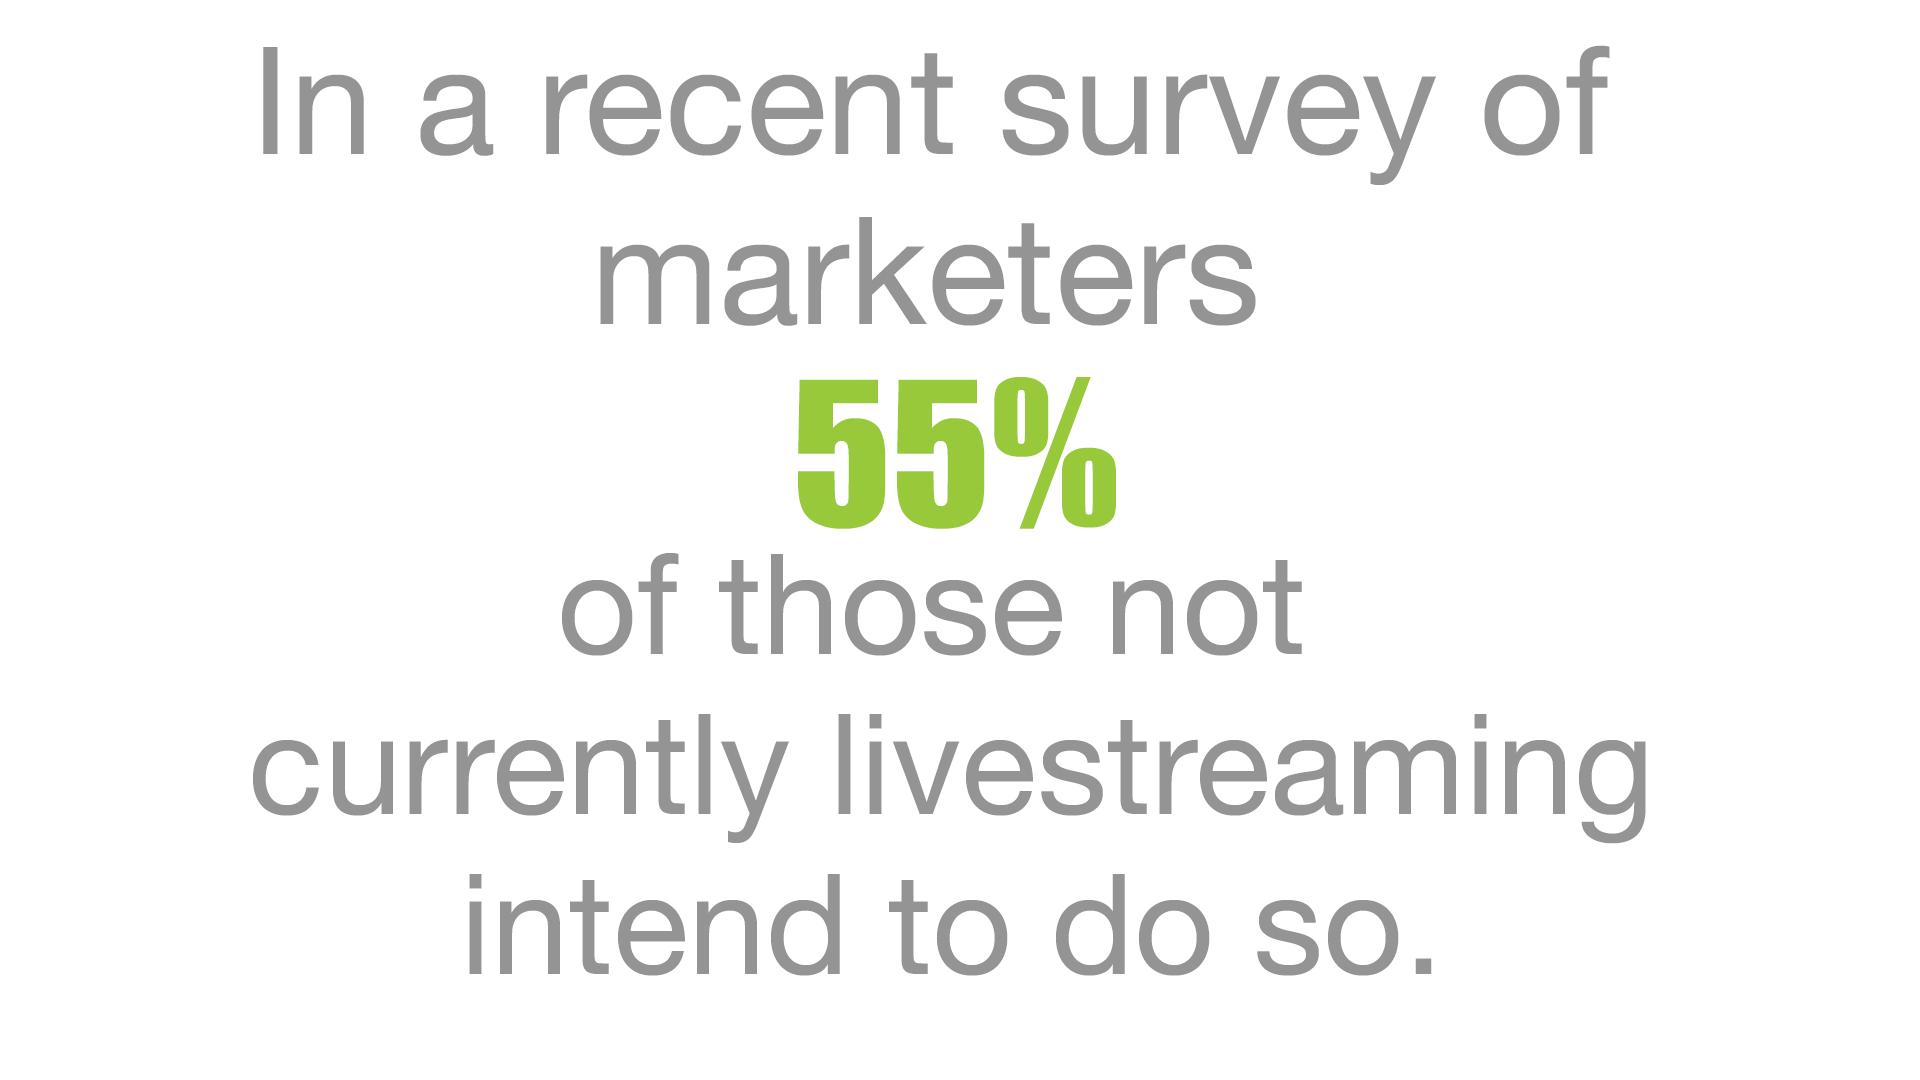 55% plan to livestream